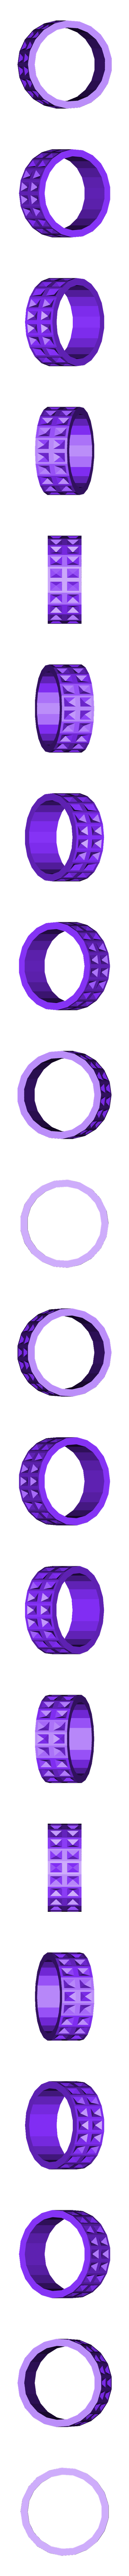 "04.stl Download free STL file the ""Bling Rings"" • 3D print model, leFabShop"